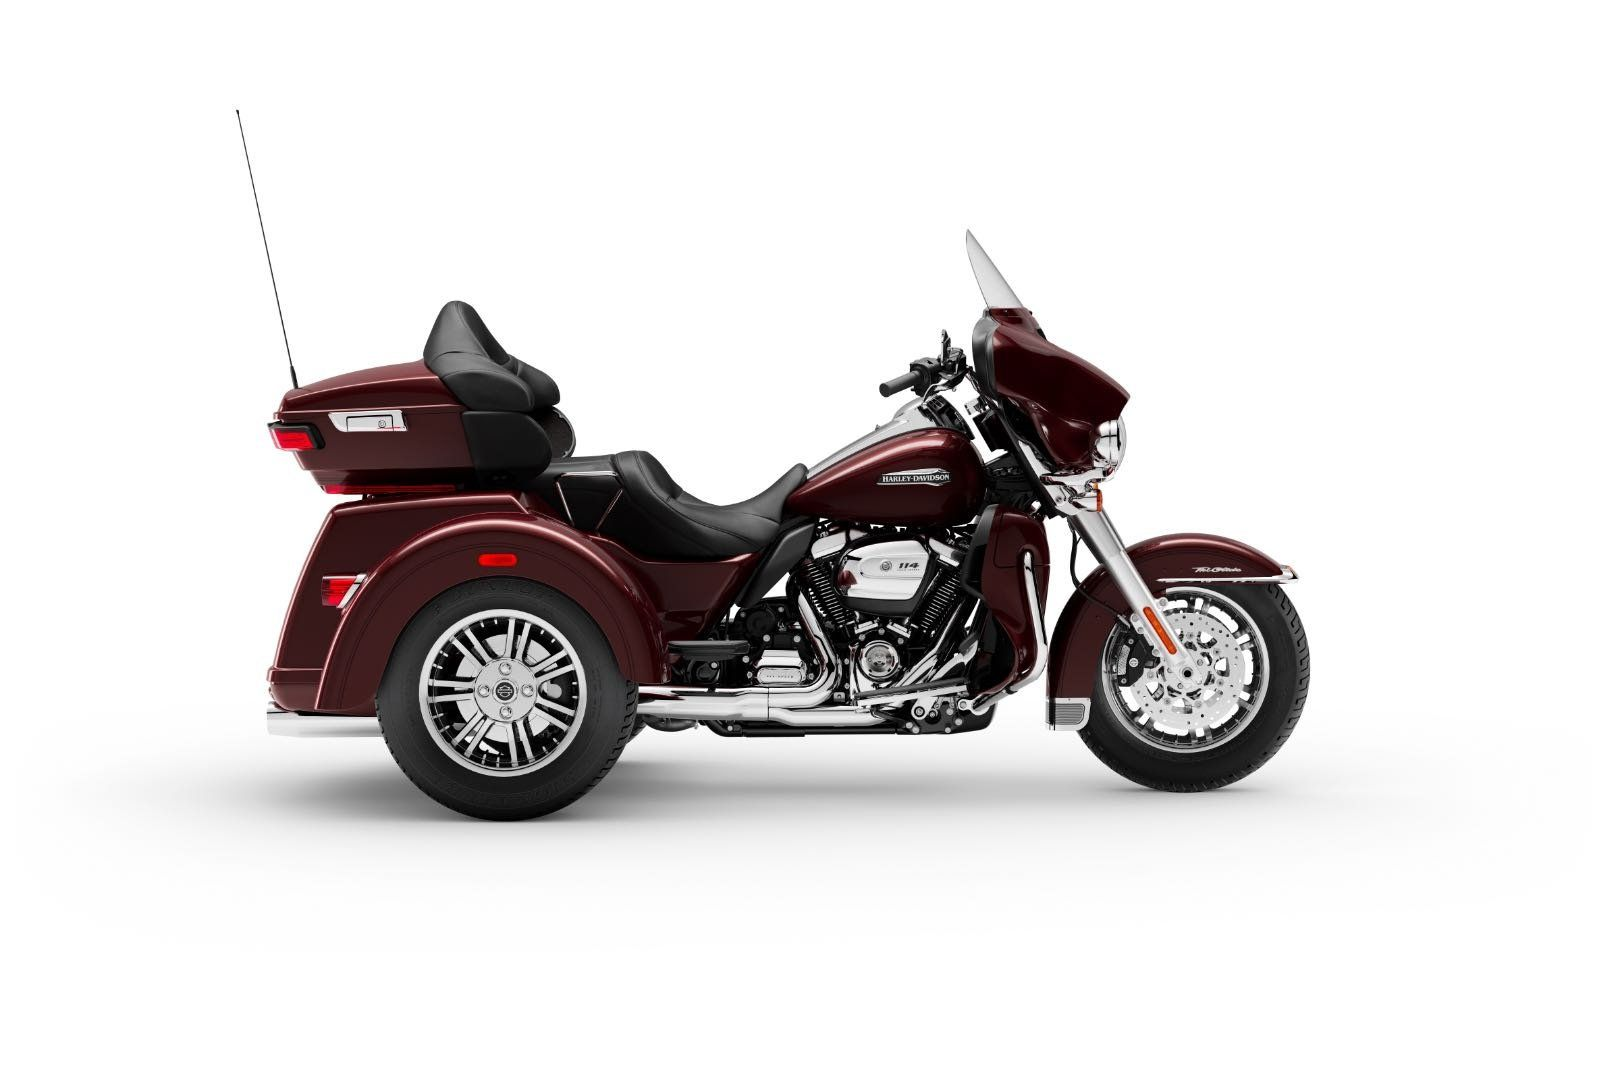 2019 Harley Davidson Trike Reviews Reviews From 2019 Harley Davidson Trike Updates Tri Glide Ultra Amp Freewheel Harley Davidson Trike Trike Harley Davidson